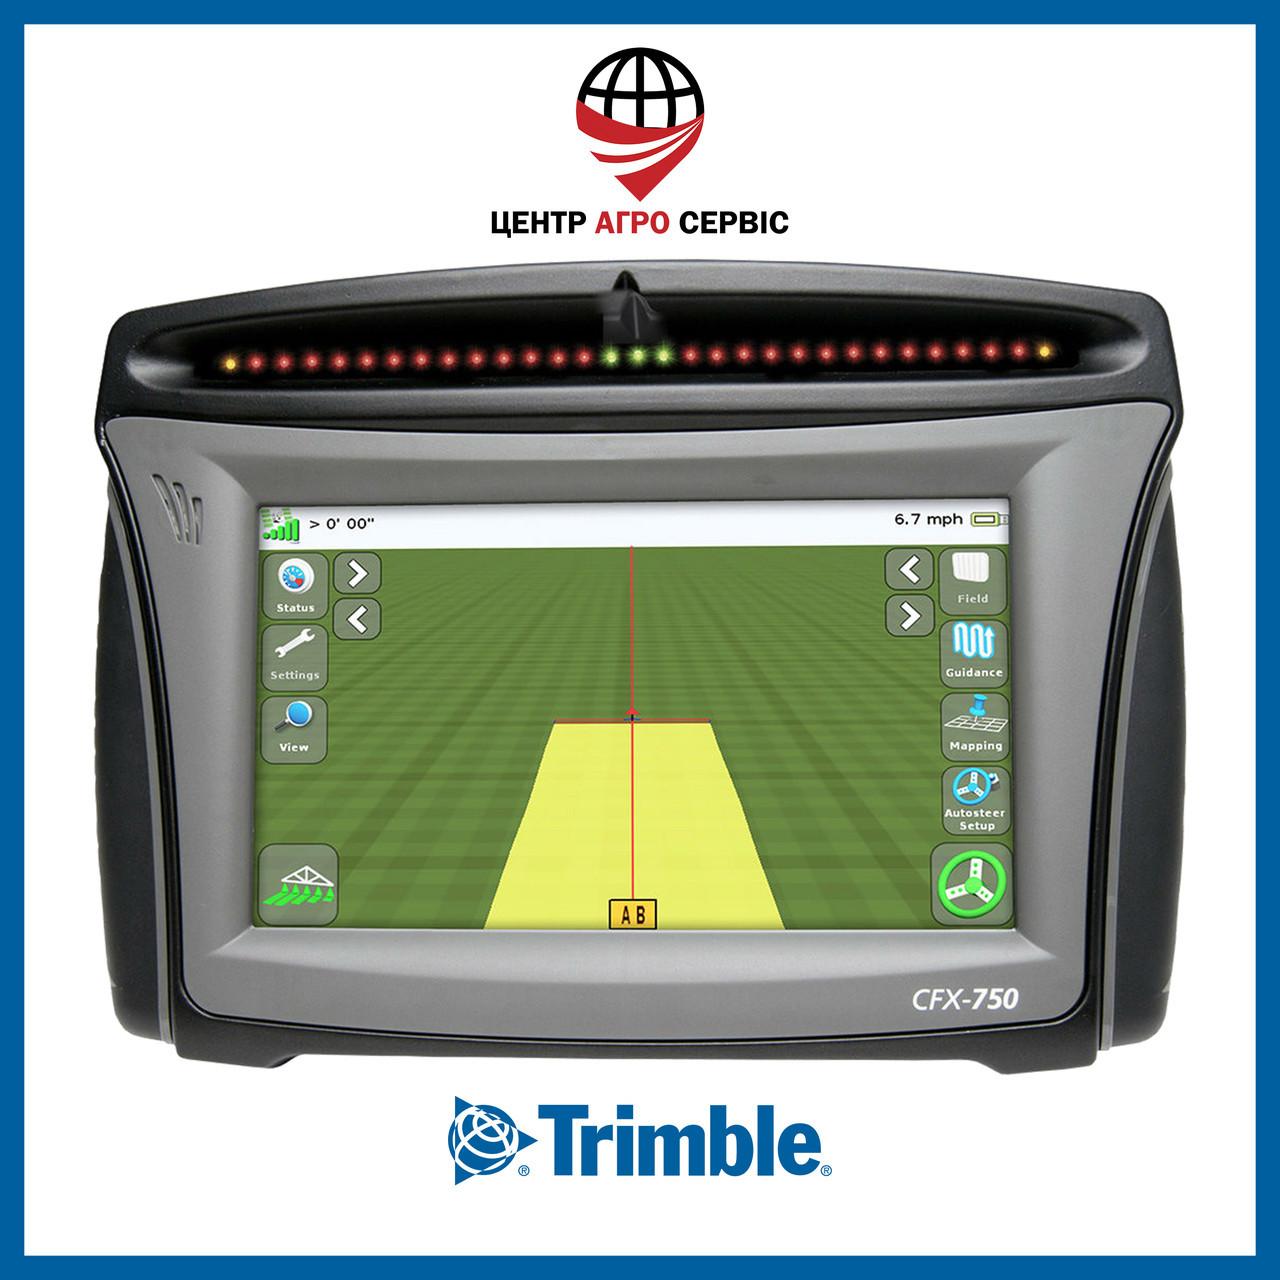 Gps навигатор для трактора (навигатор для поля, сельхоз навигатор)  Trimble CFX 750